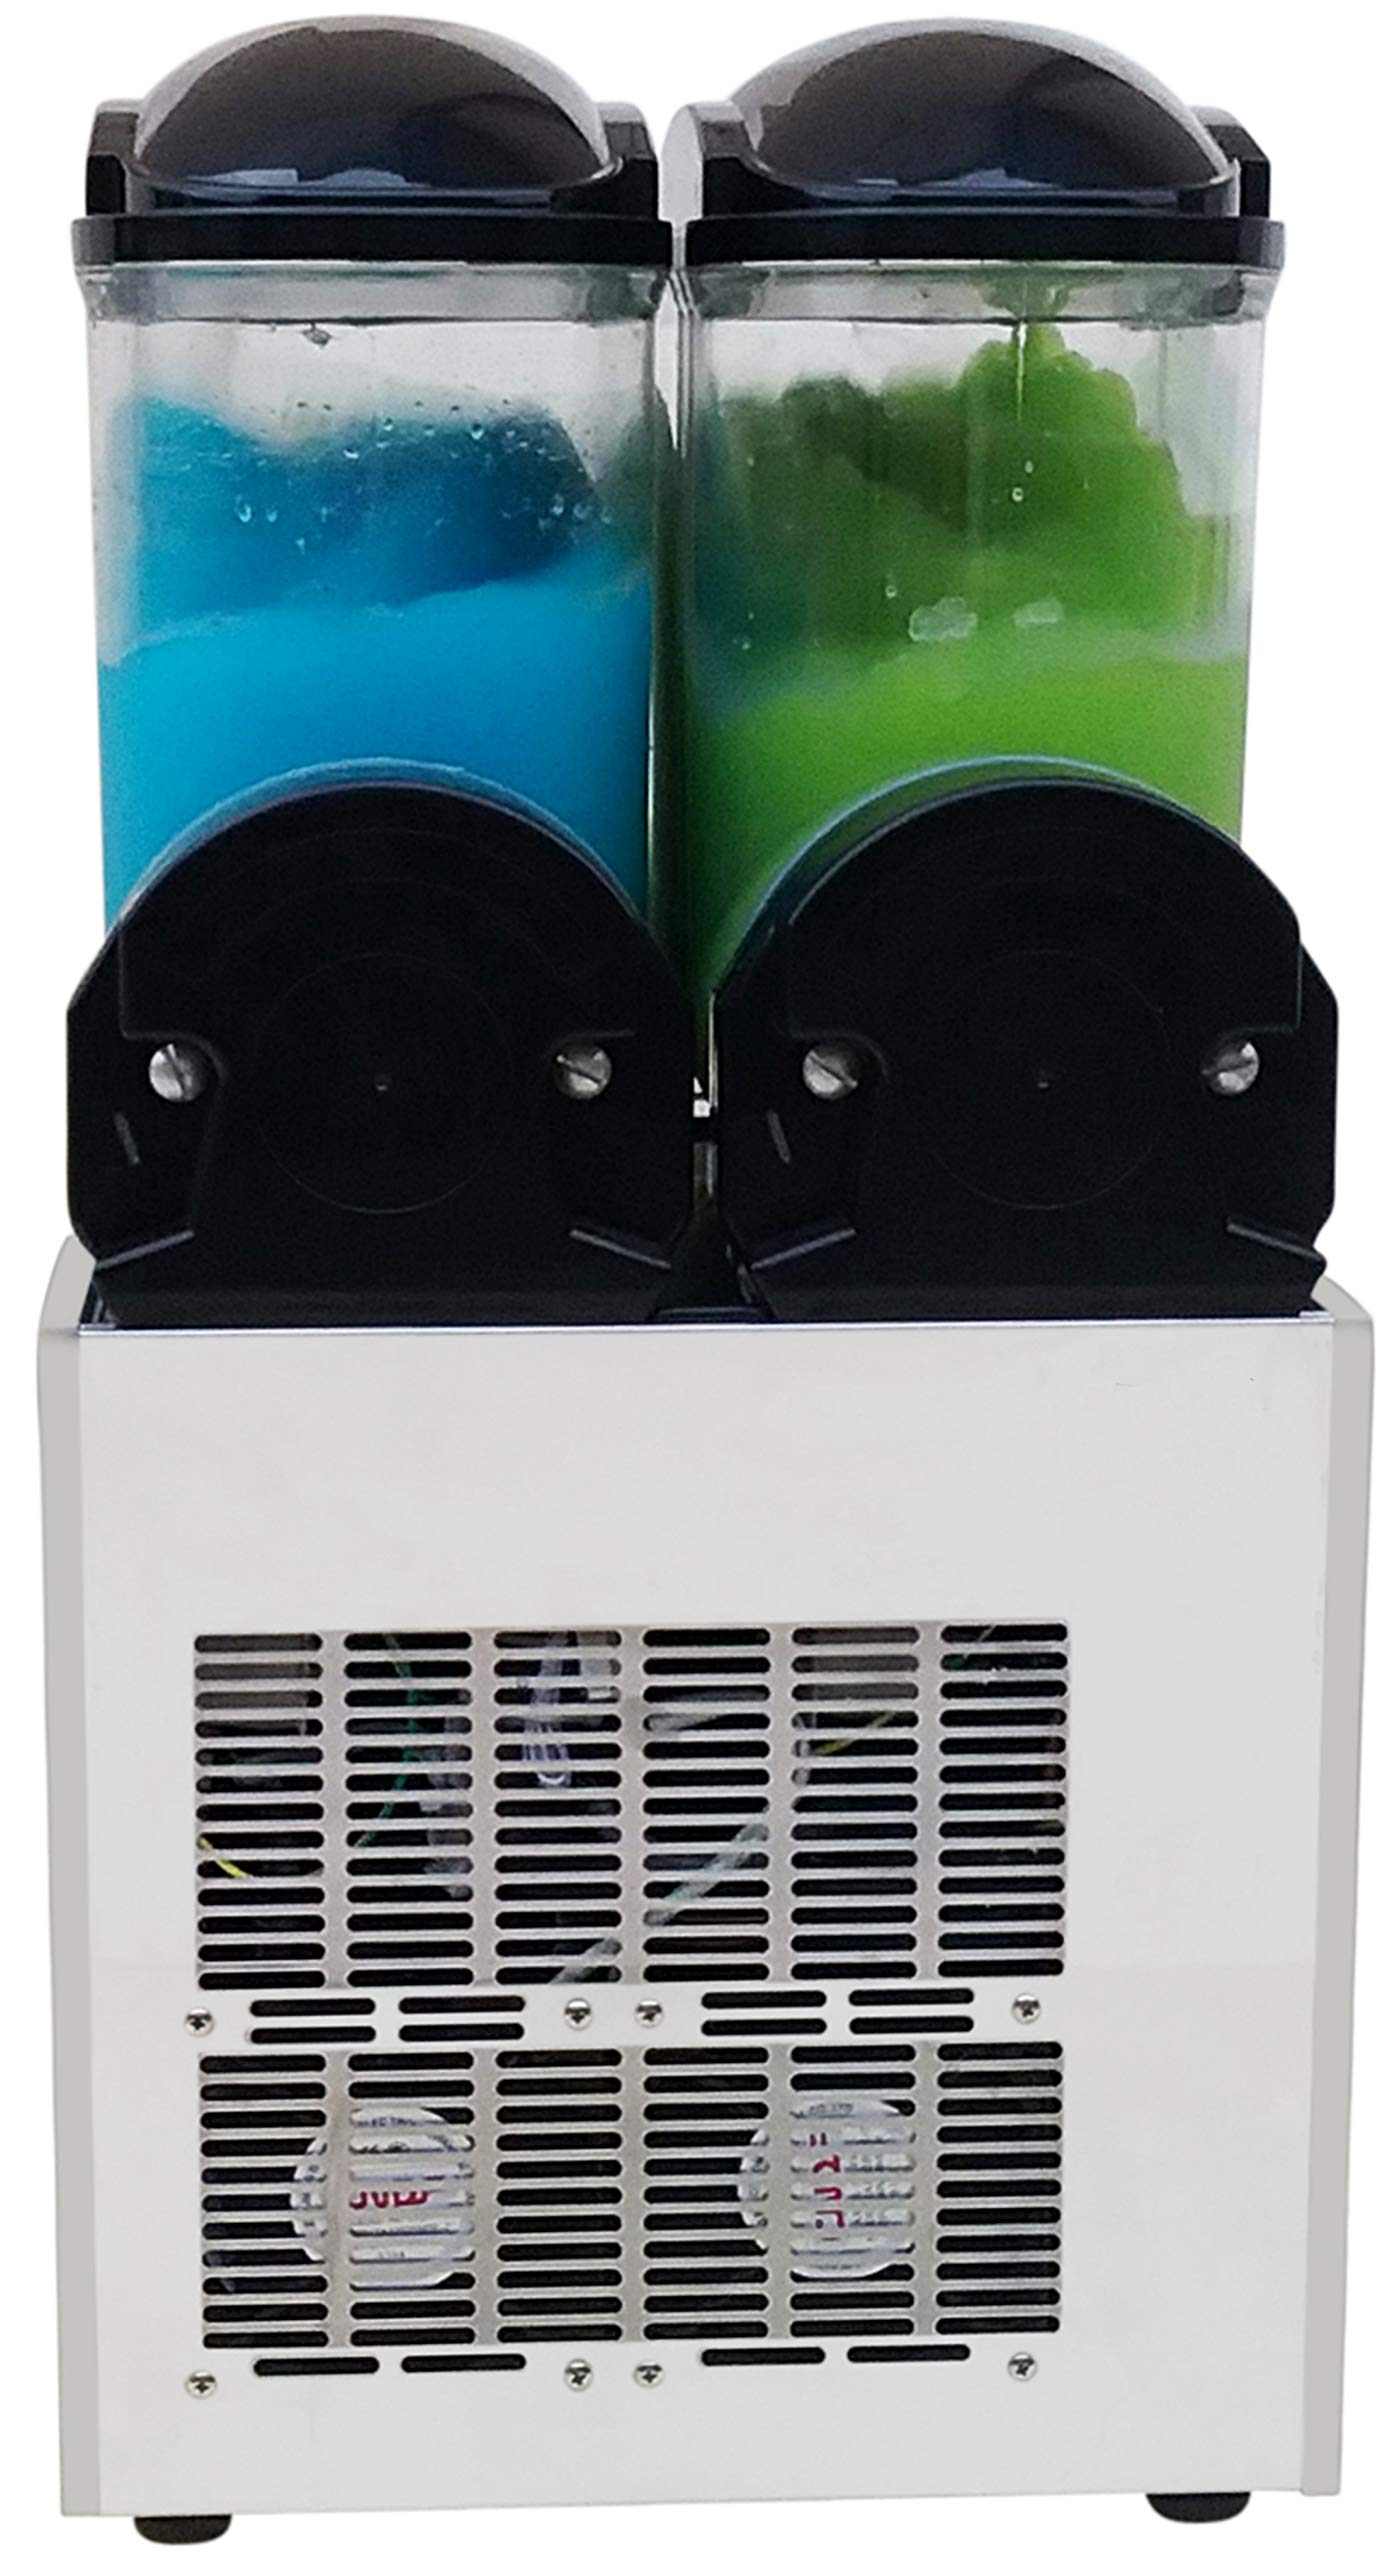 Brand : BRAVO ITALIA 2 bowls slushie machine 3.2 gallons each bowl , 100 CUPS ,COMMERCIAL GRADE MACHINE ,Margarita Machine , Slushie Maker , Margarita Maker , Slushy Machine by BRAVO ITALIA (Image #4)